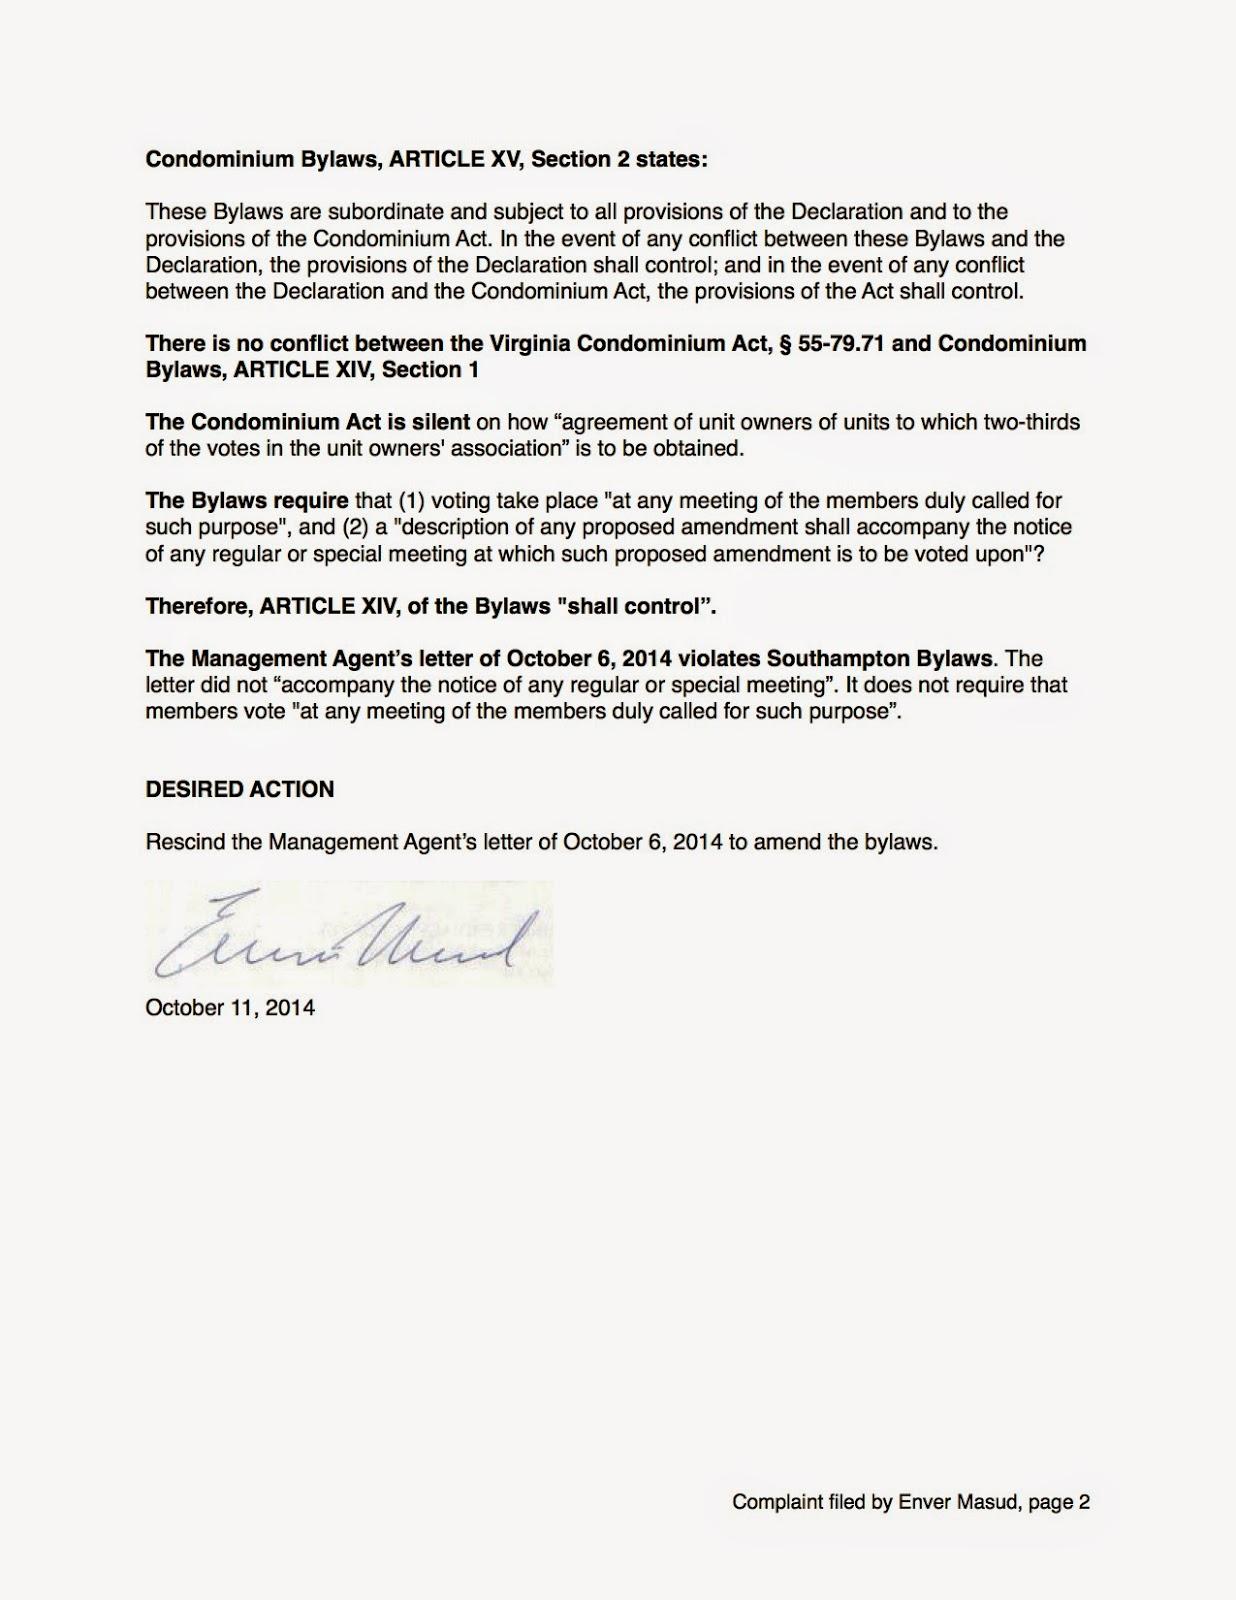 Southampton 22202: Formal complaint regarding bylaw amendment ...